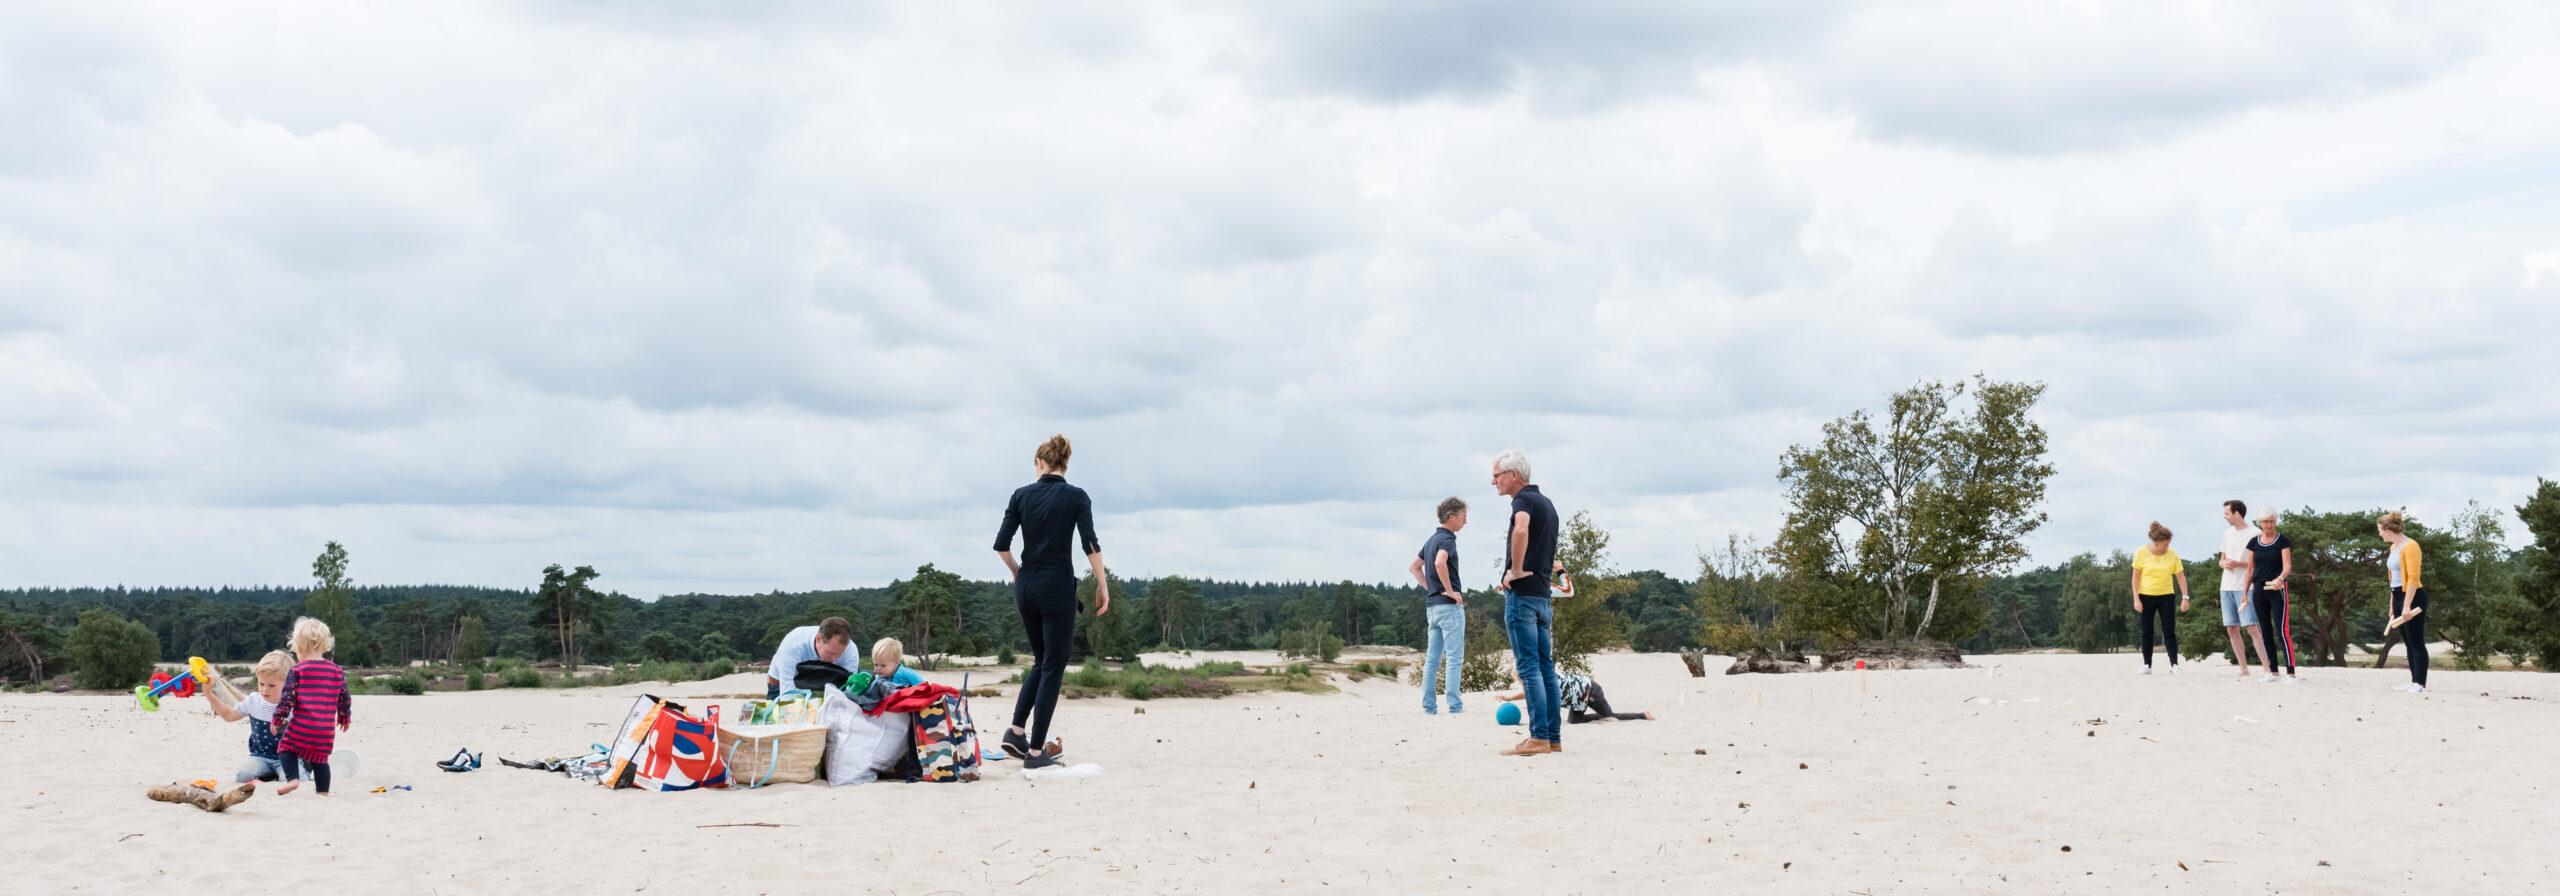 Familiedag met picknick Jasja de Wit Fotografie Herinneringsfotografie